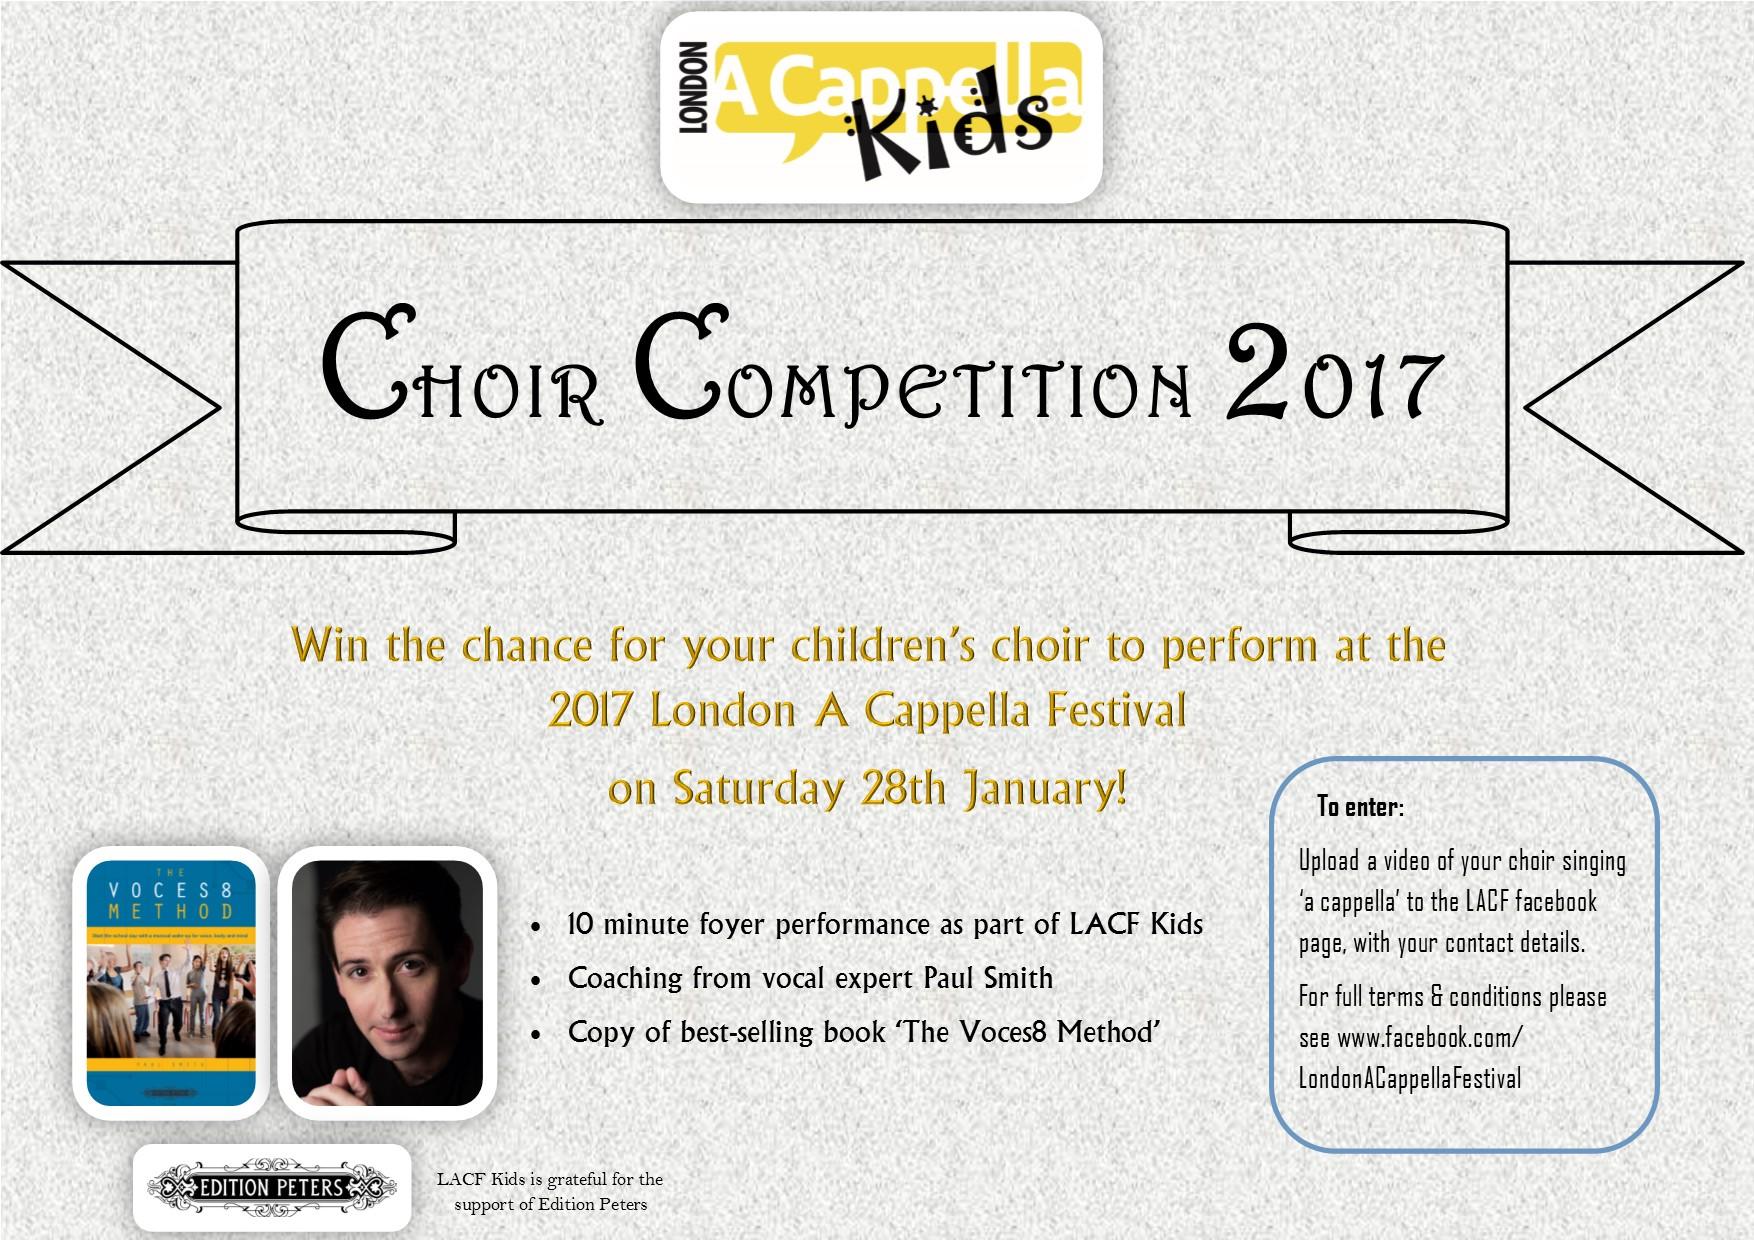 LACF Kids Choir Competition 2017a.jpg